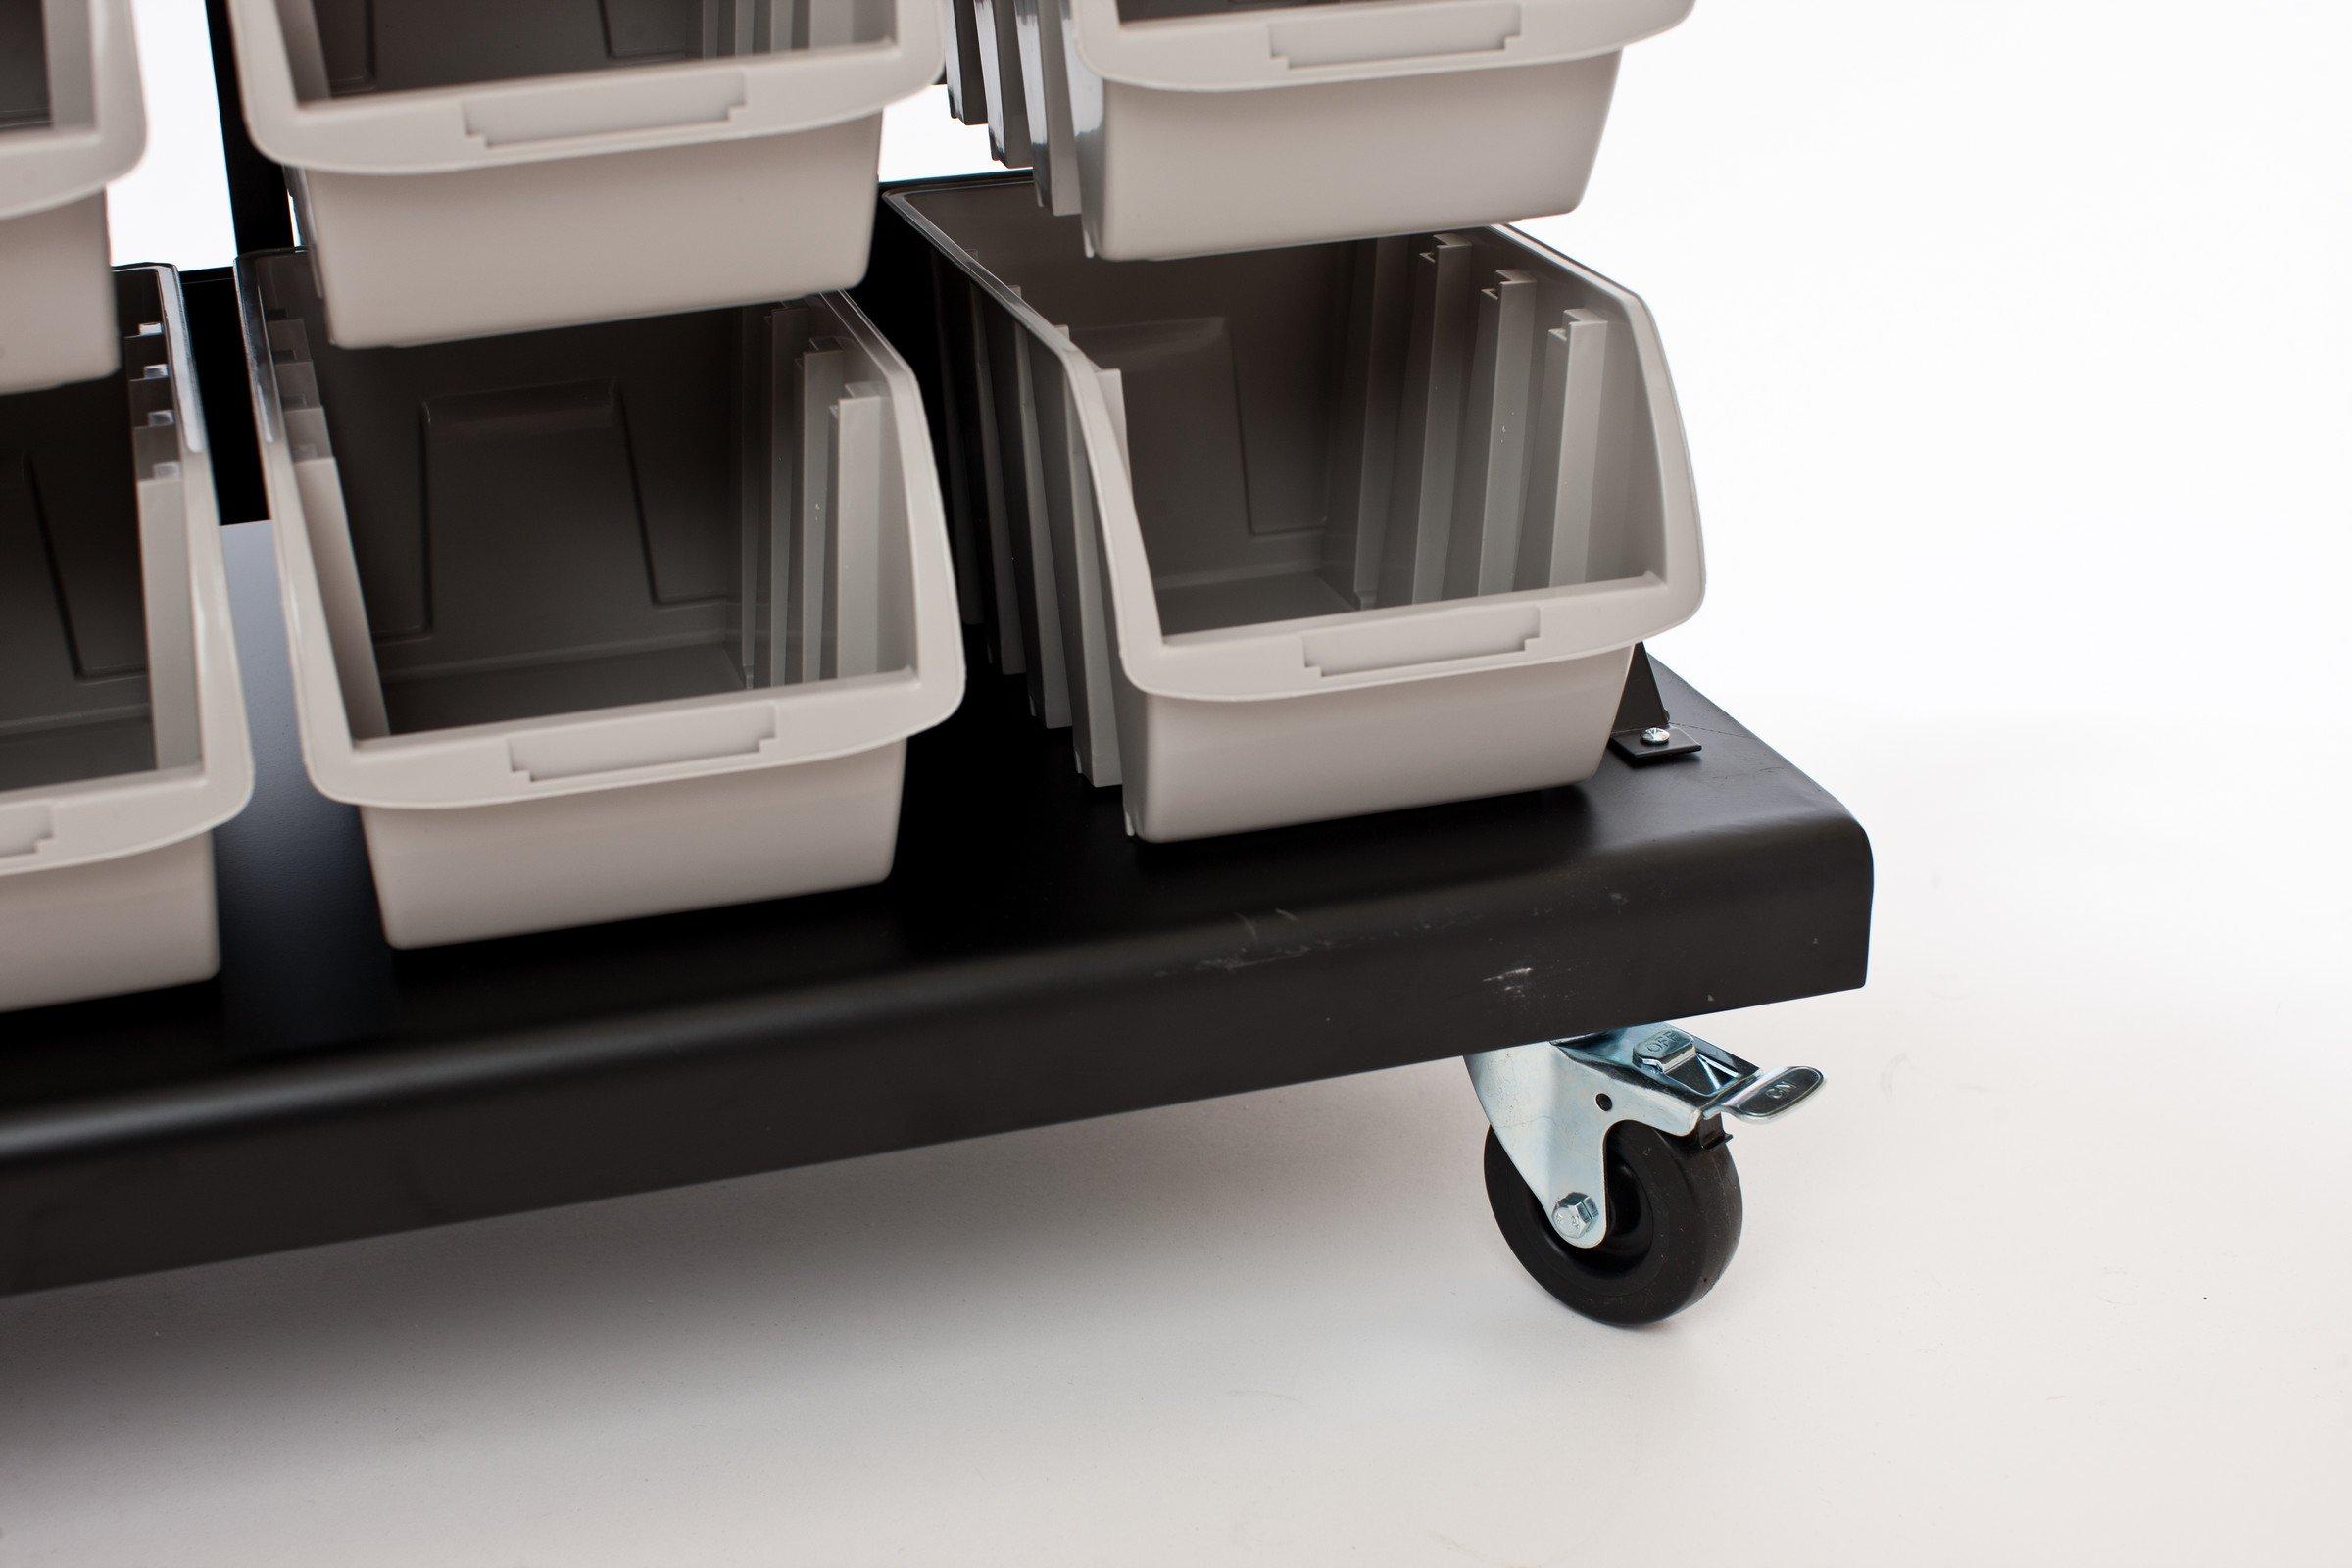 TRINITY Dual-Sided Mobile Bin Rack by Trinity (Image #7)